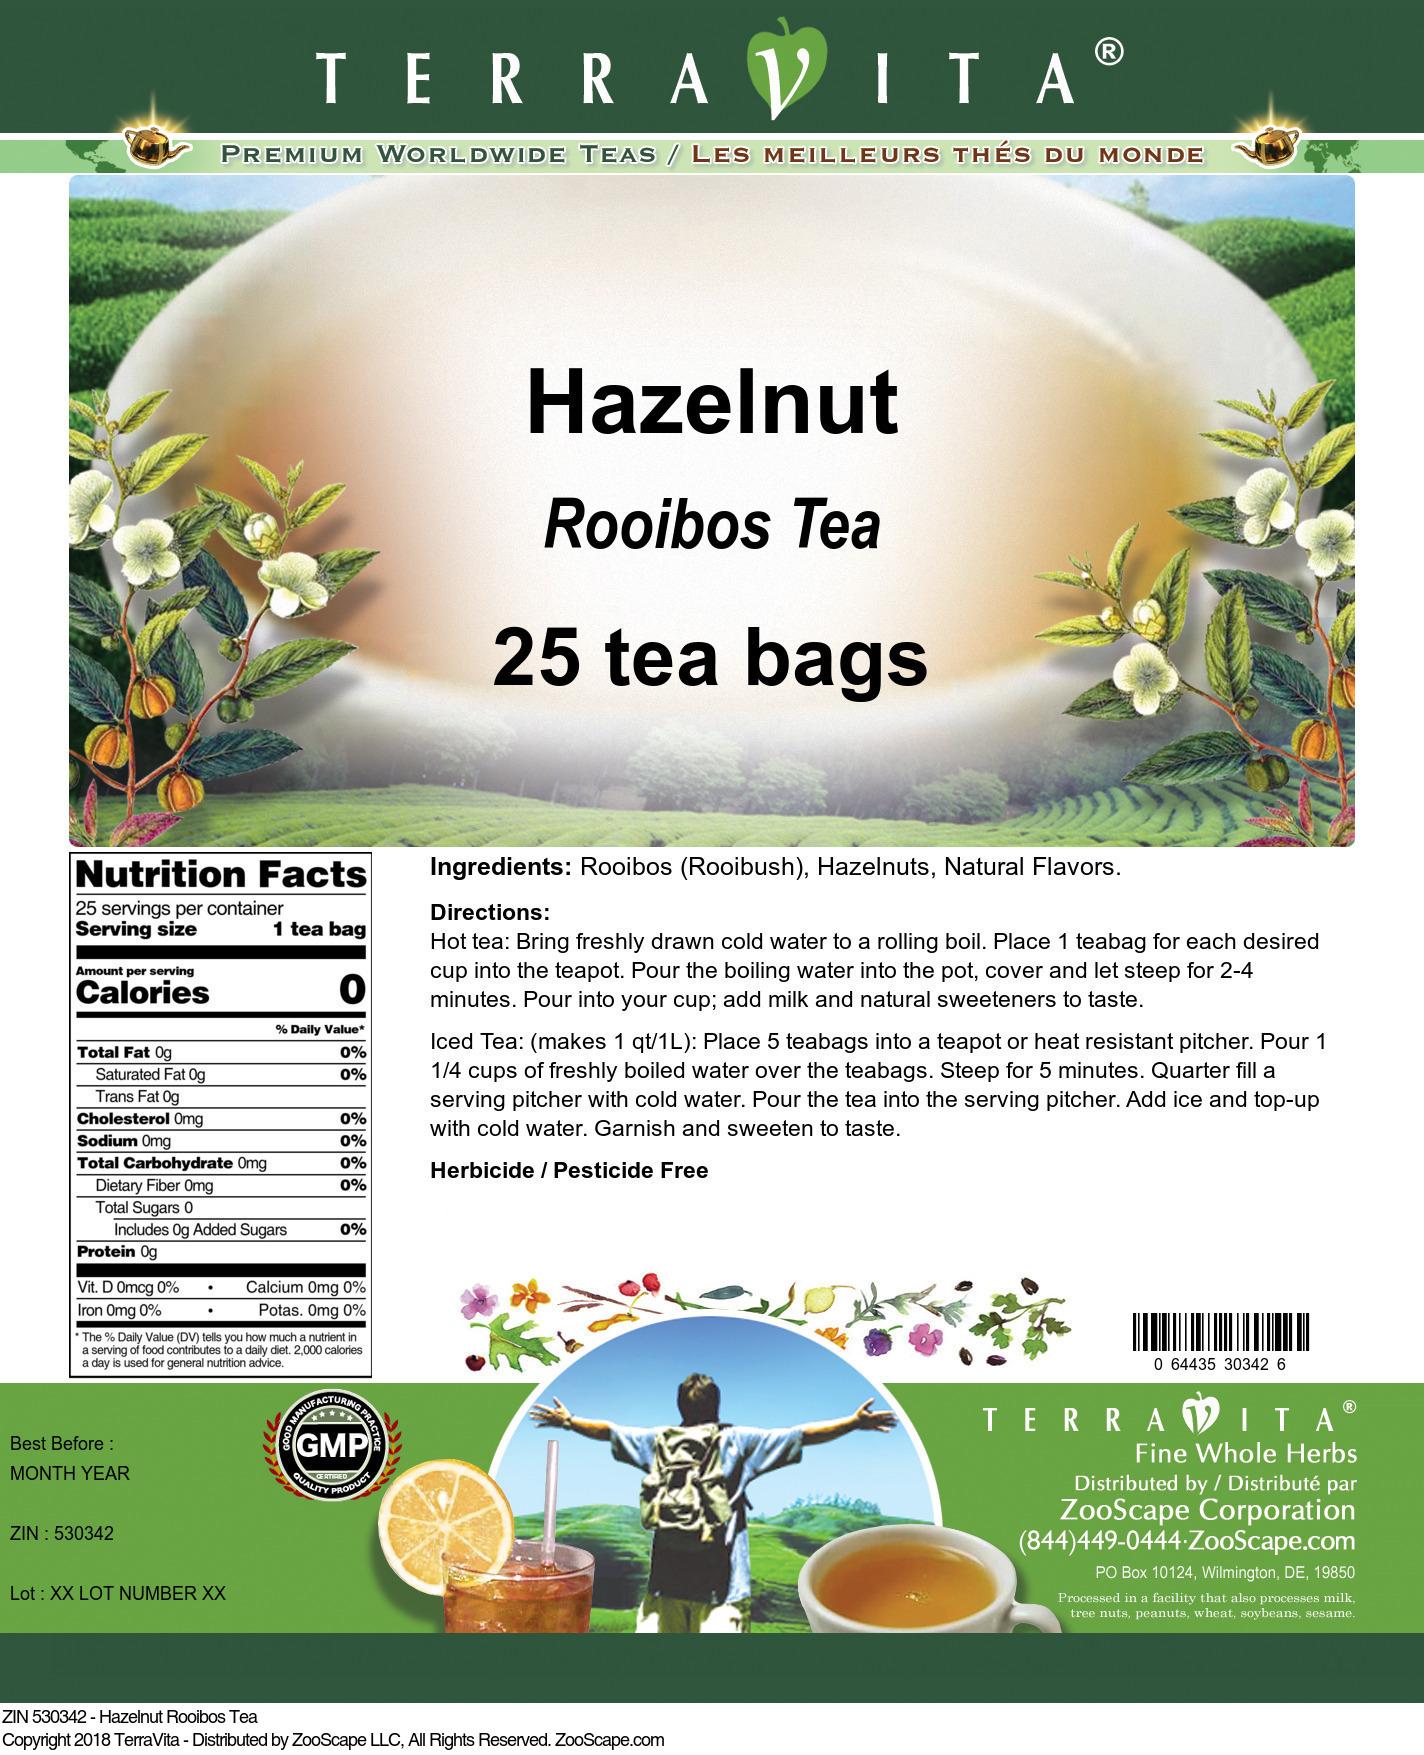 Hazelnut Rooibos Tea